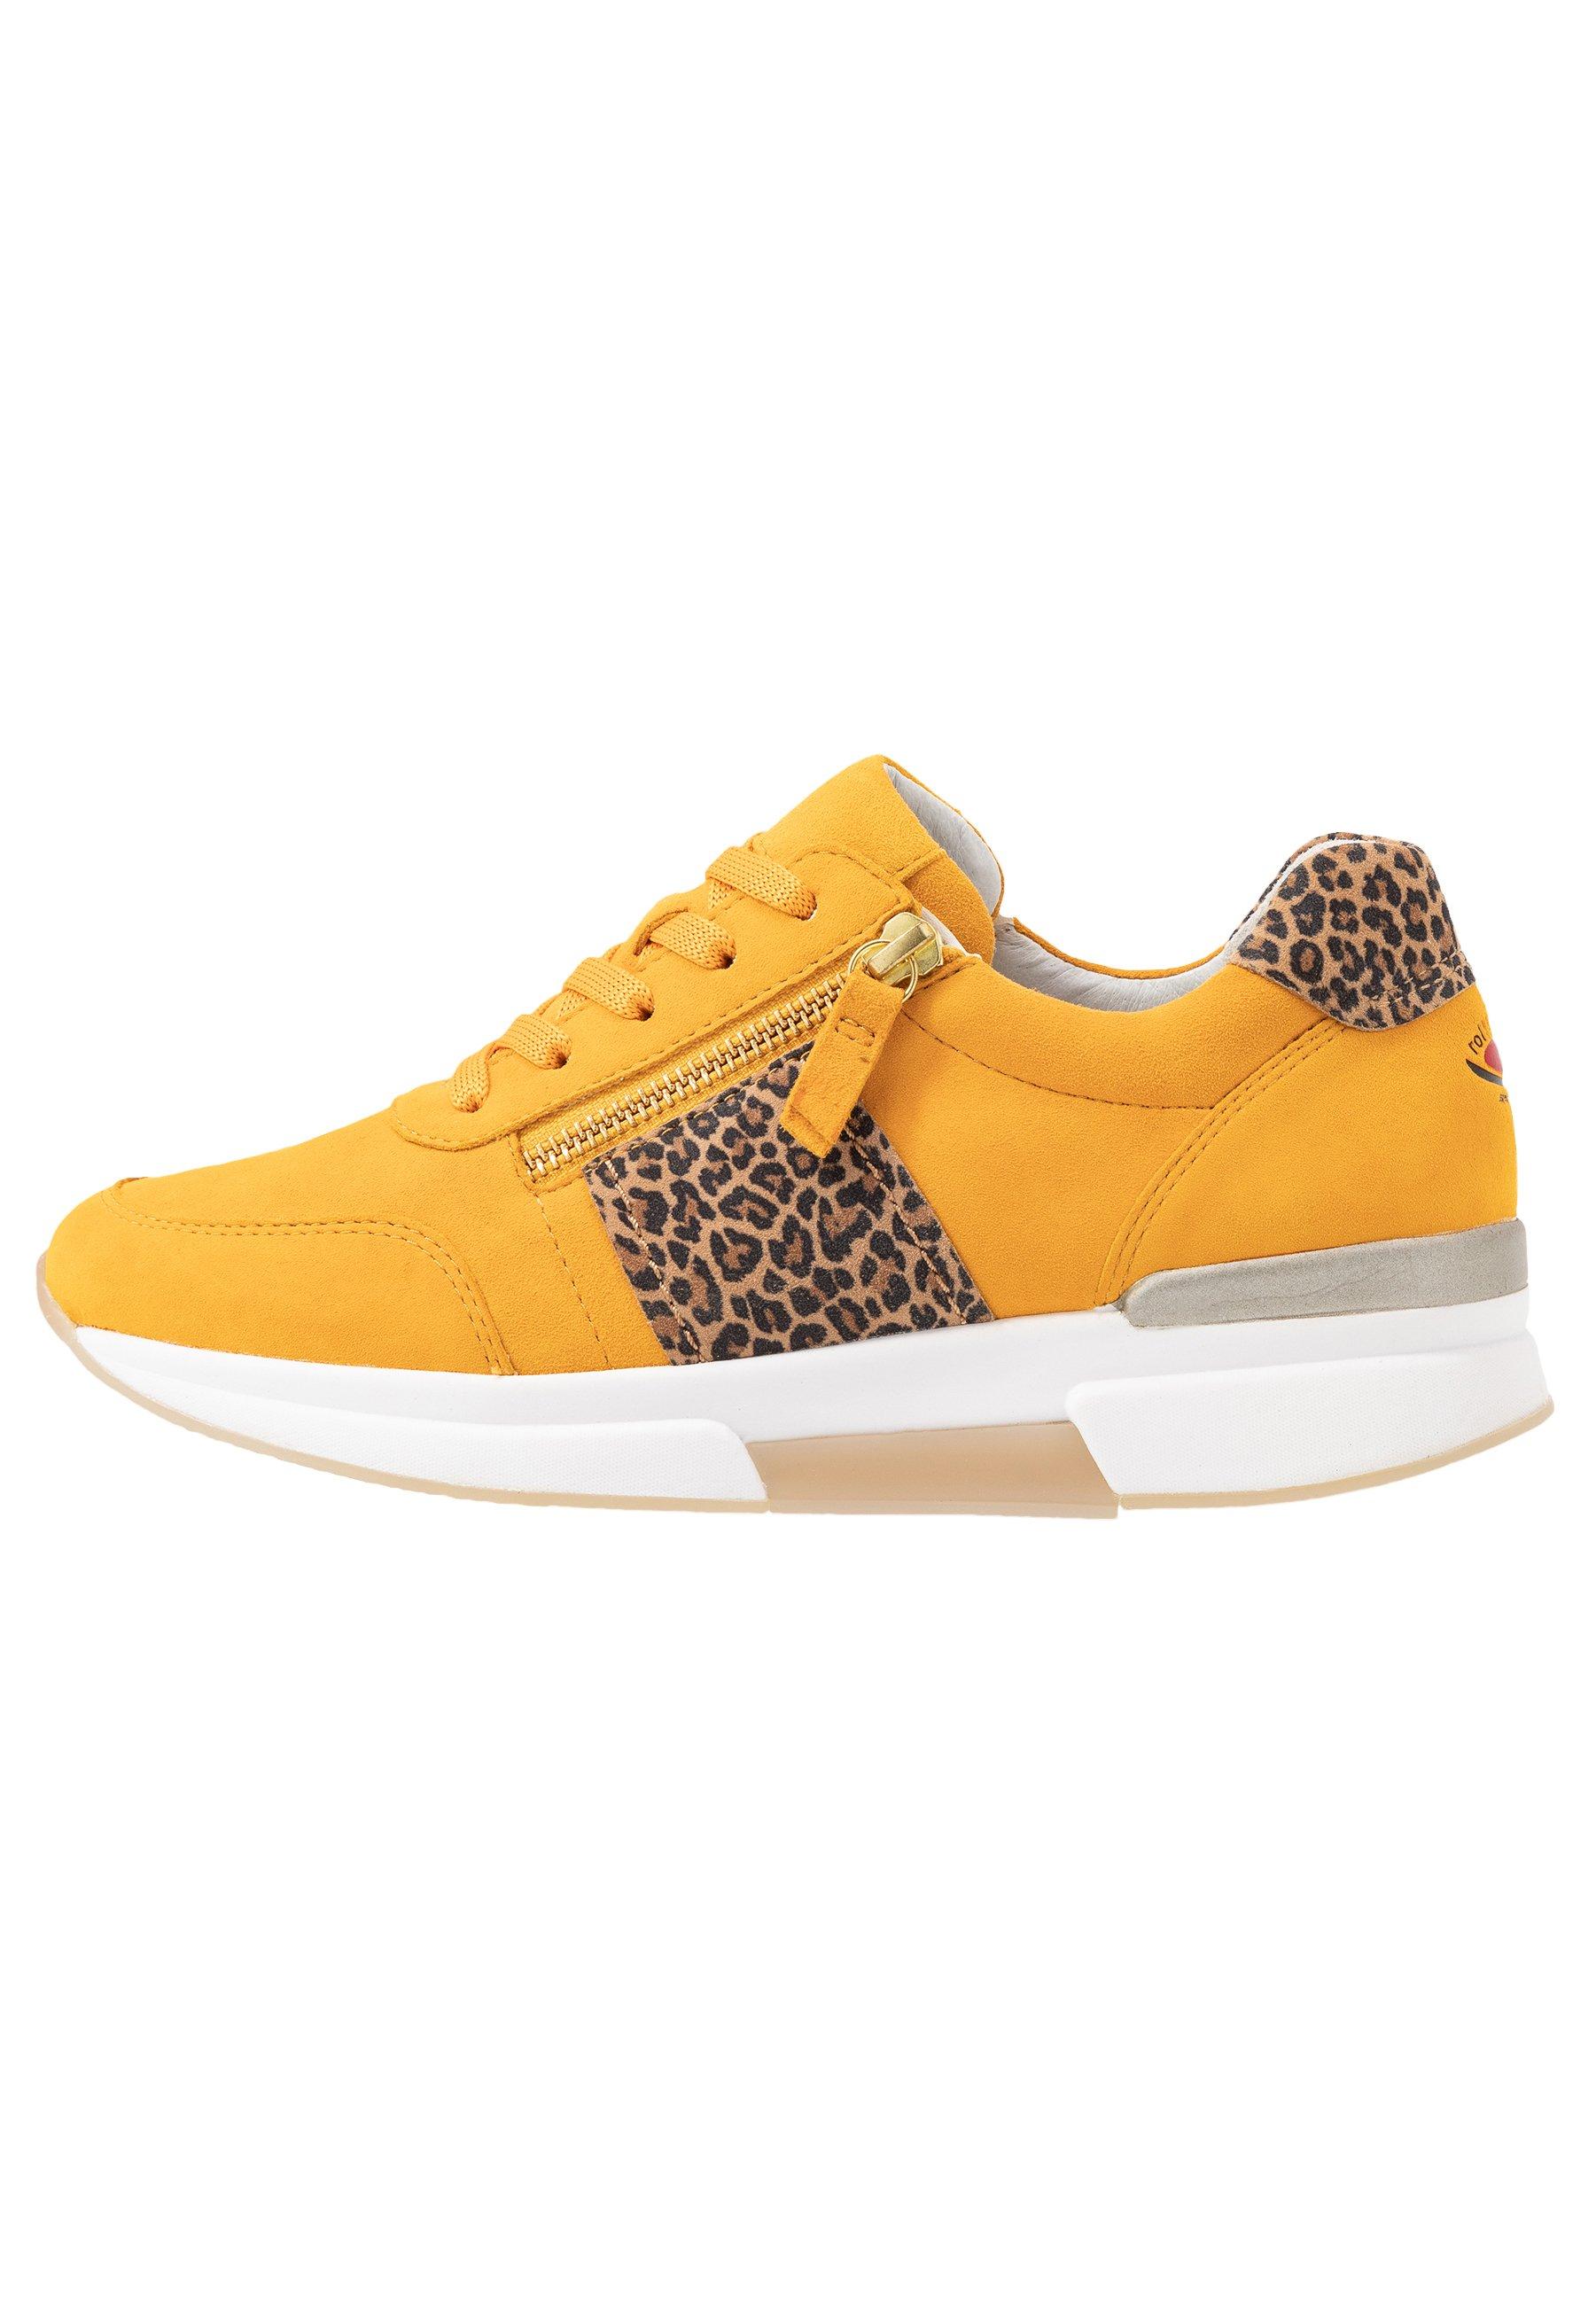 Gabor Comfort Rolling Soft - Sneakers Mango/natur